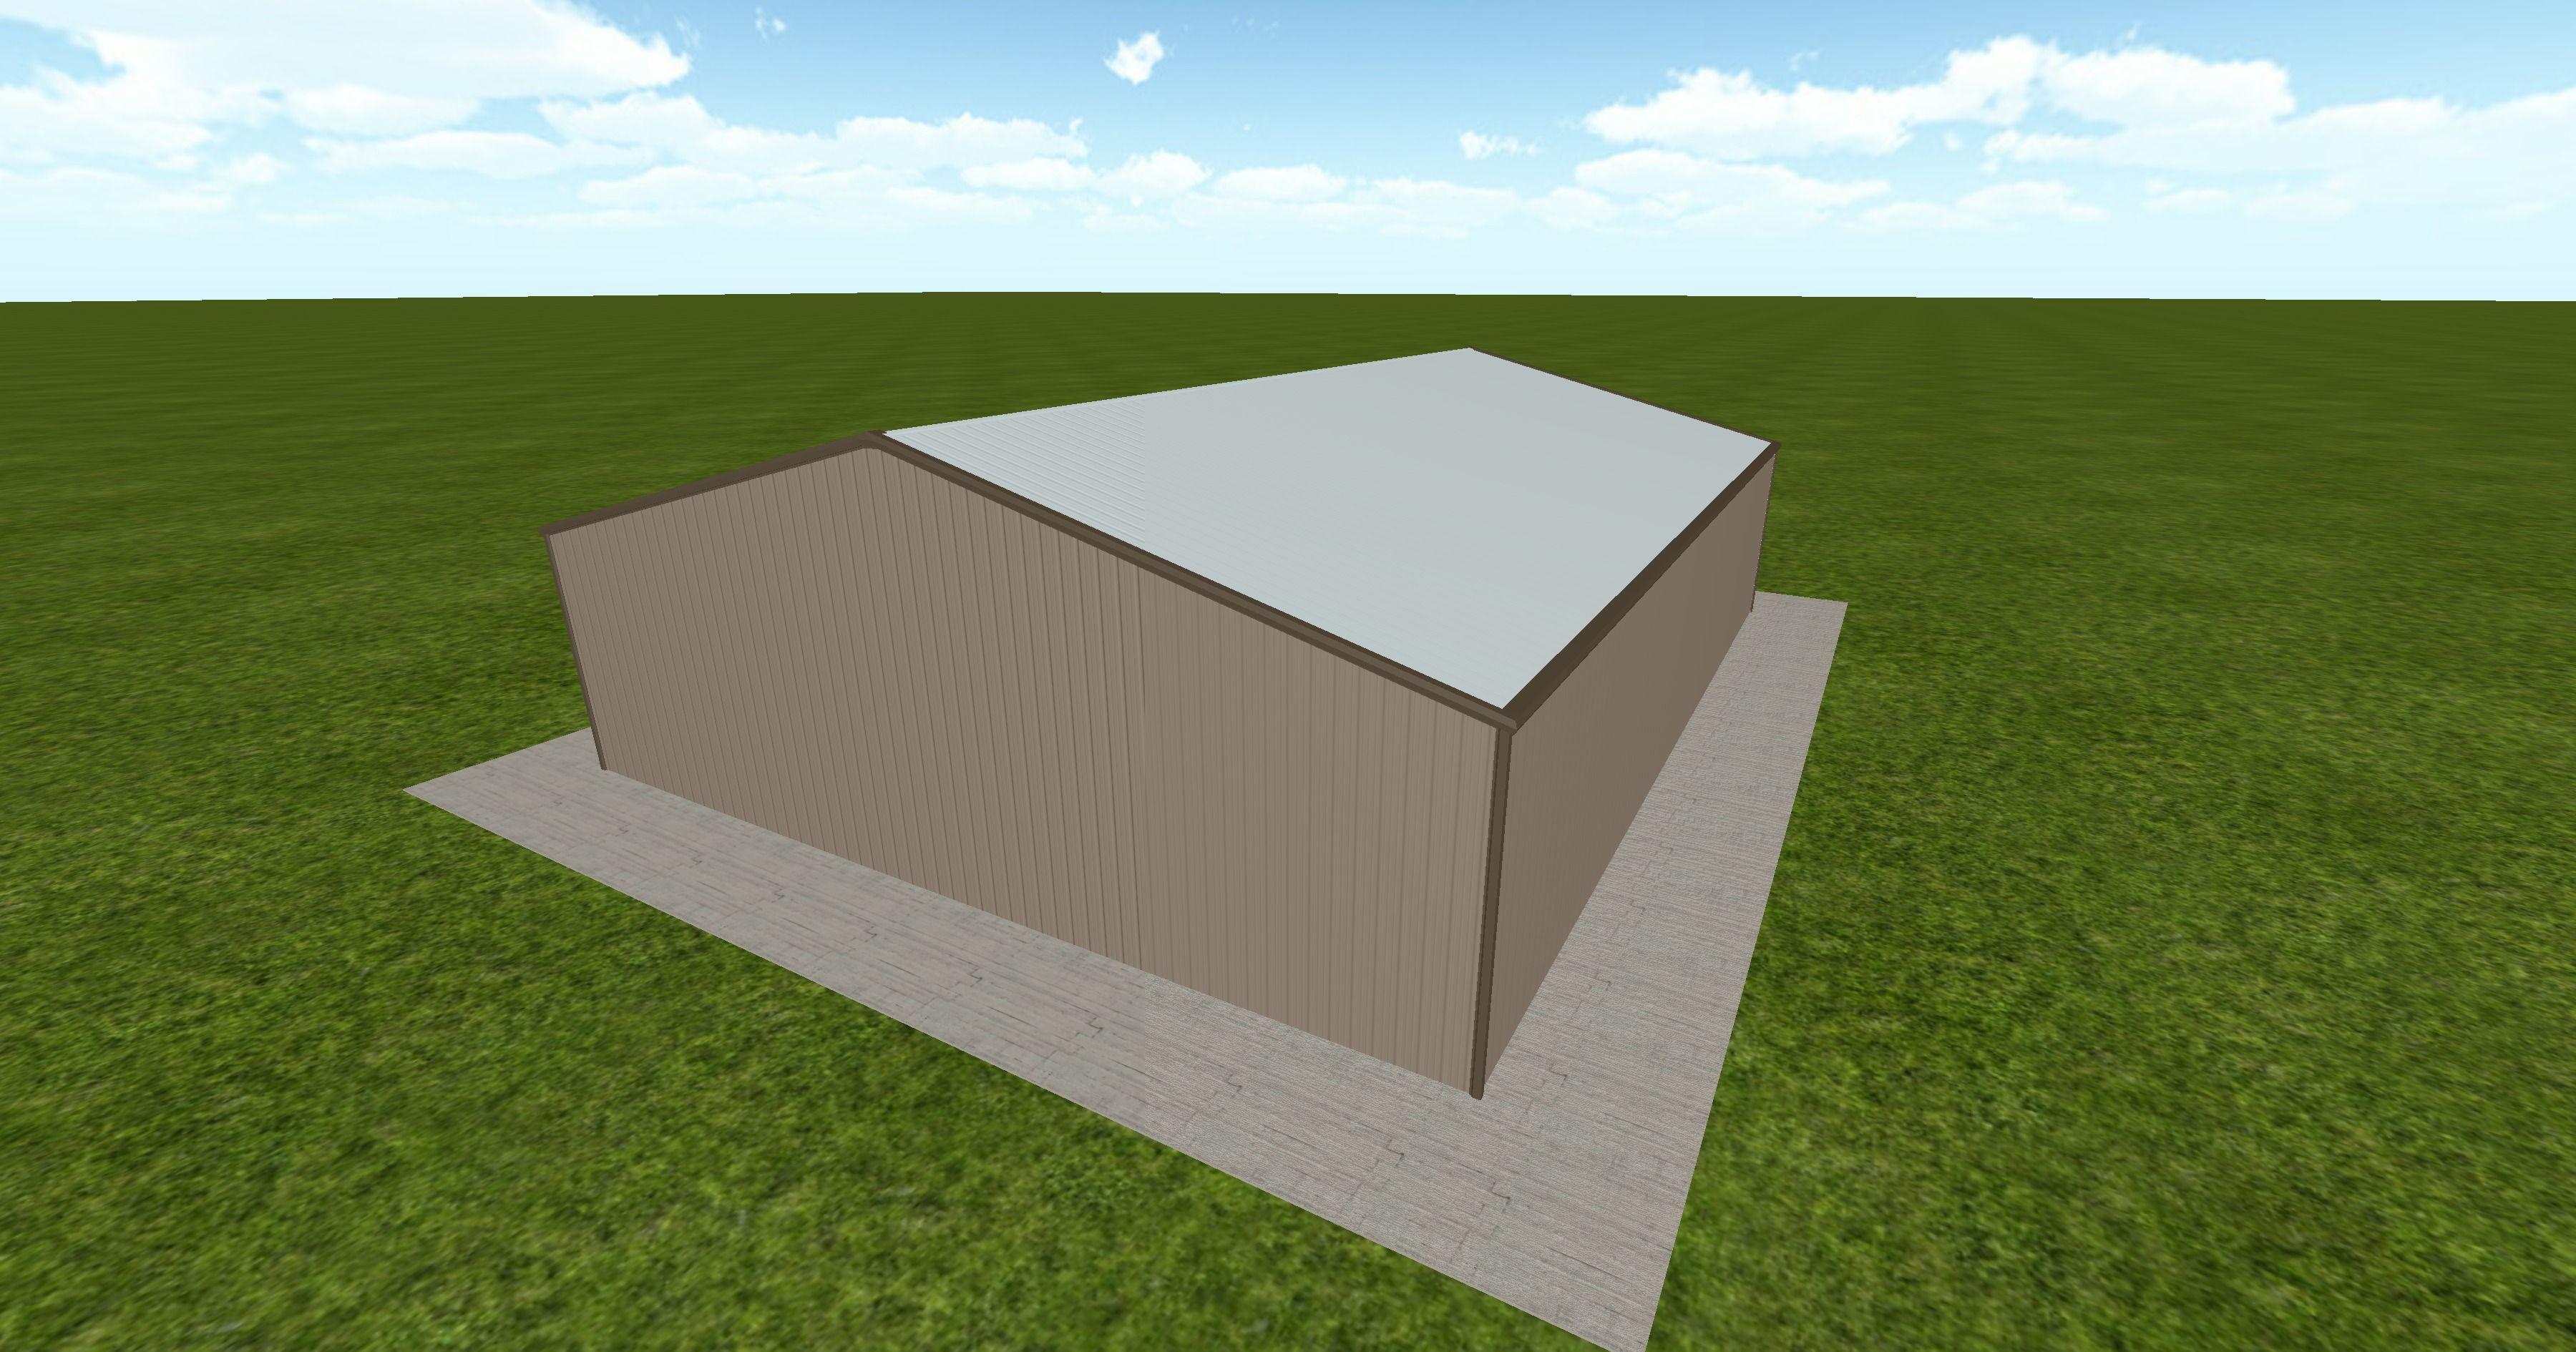 Cool 3d Marketing Http Ift Tt 2faatrq Barn Workshop Greenhouse Garage Roofing Diy 3d Building Design Mueller Buildings Roof Architecture